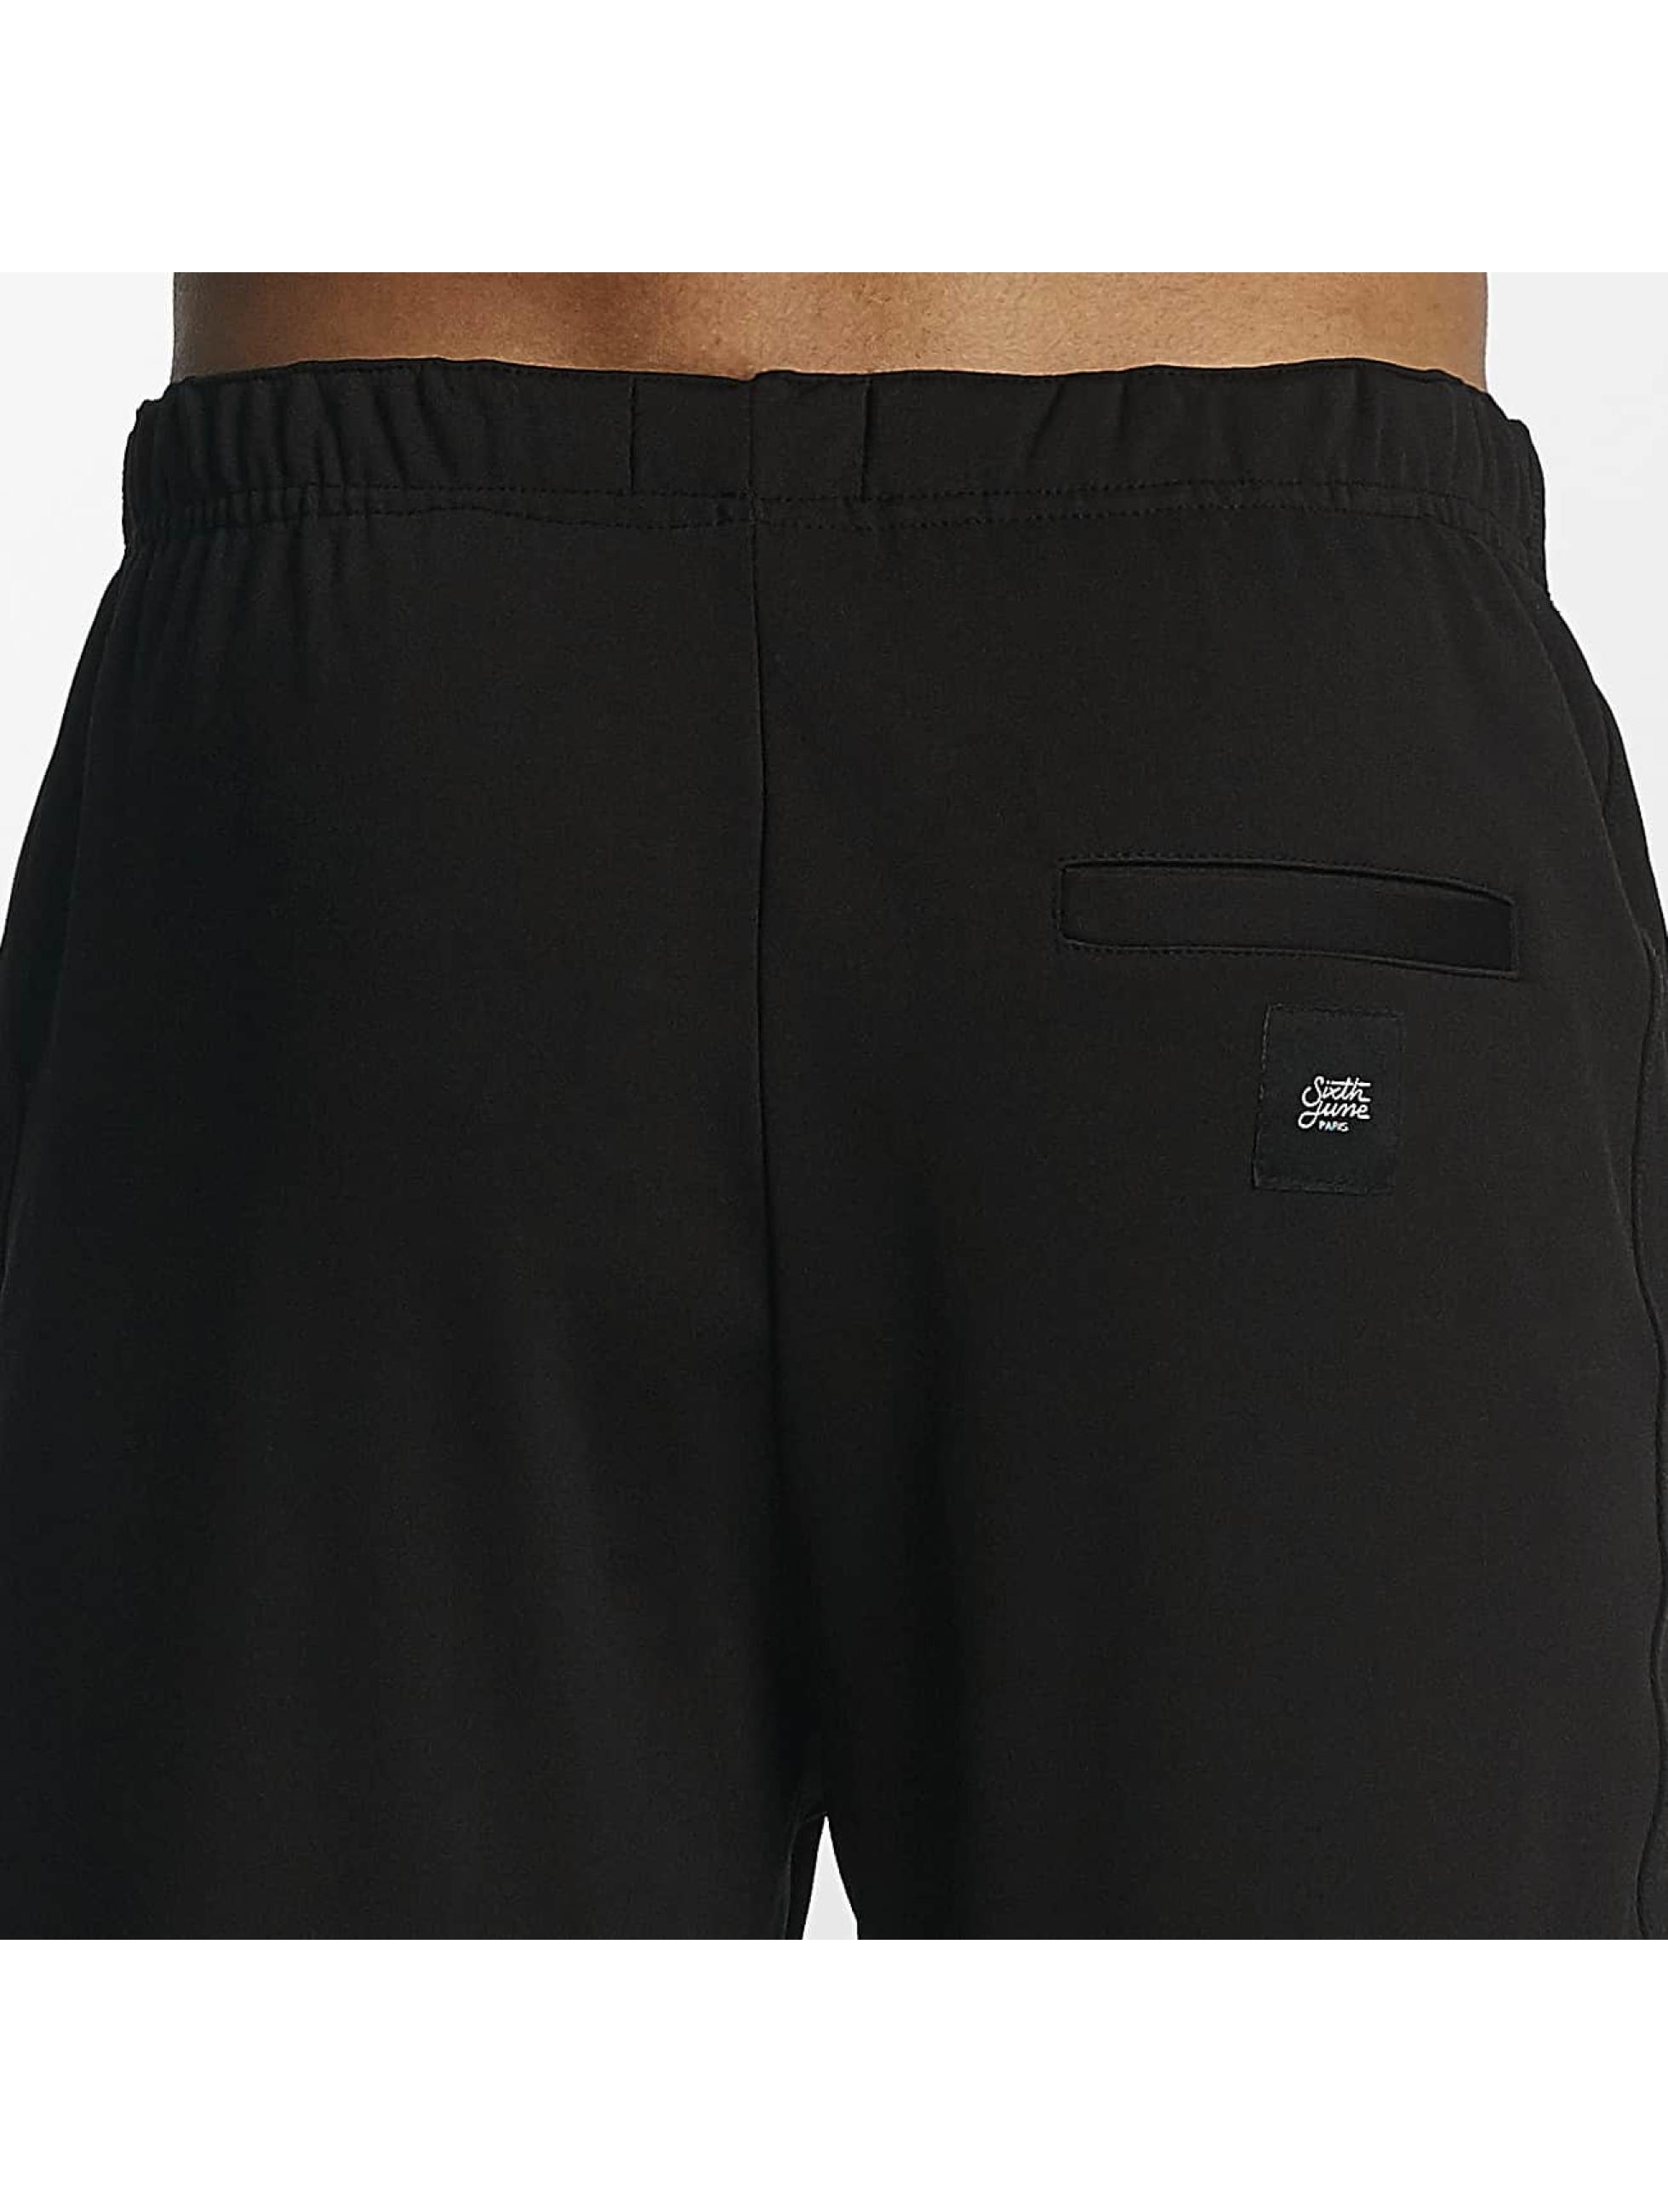 Sixth June Pantalón deportivo Regular negro